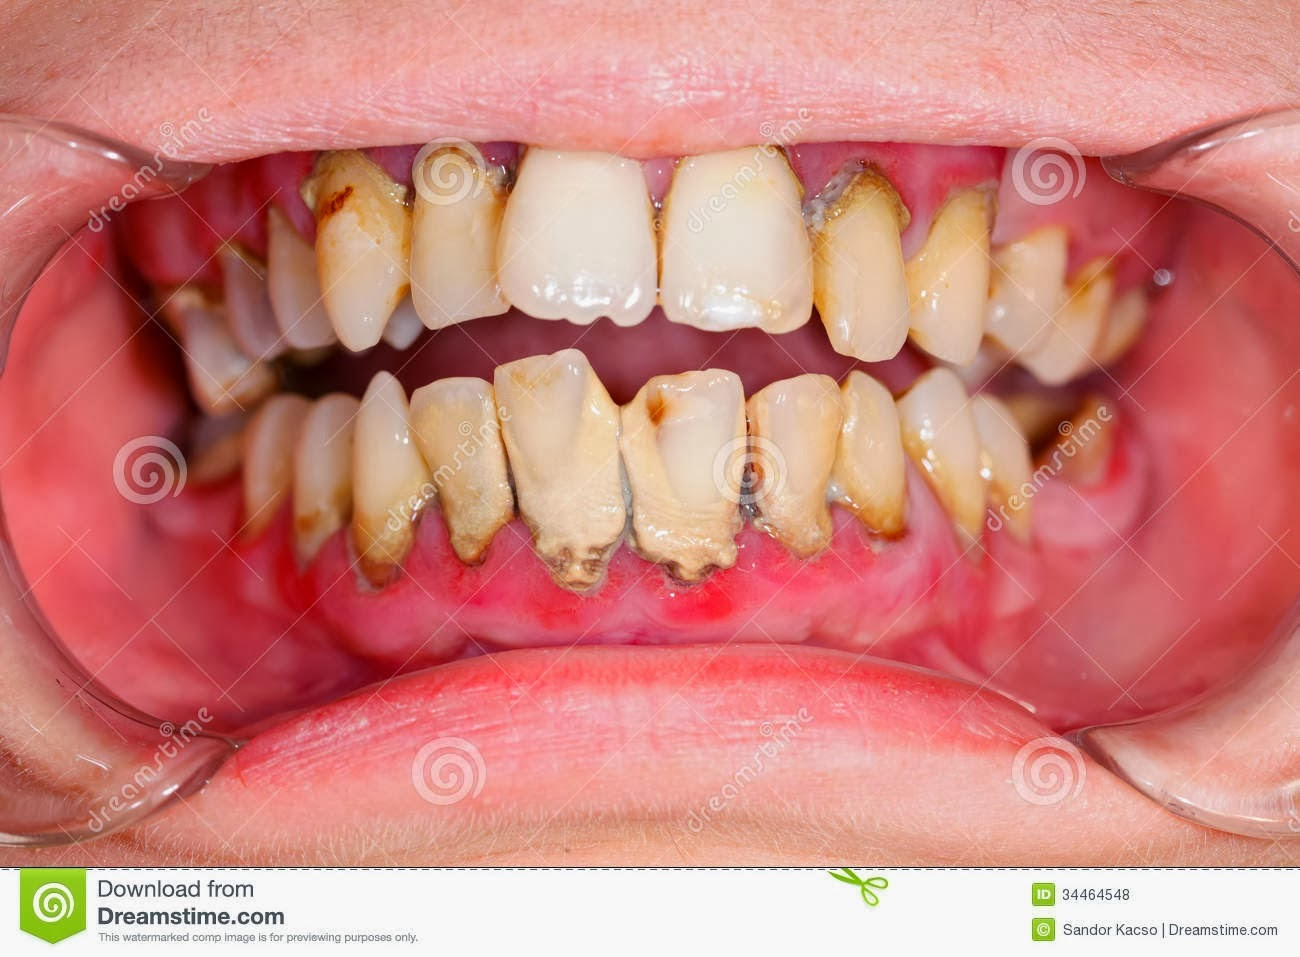 DENTAL: ANUG (Acute Necrotizing Ulcerative Gingivitis) Or Trench Mouth